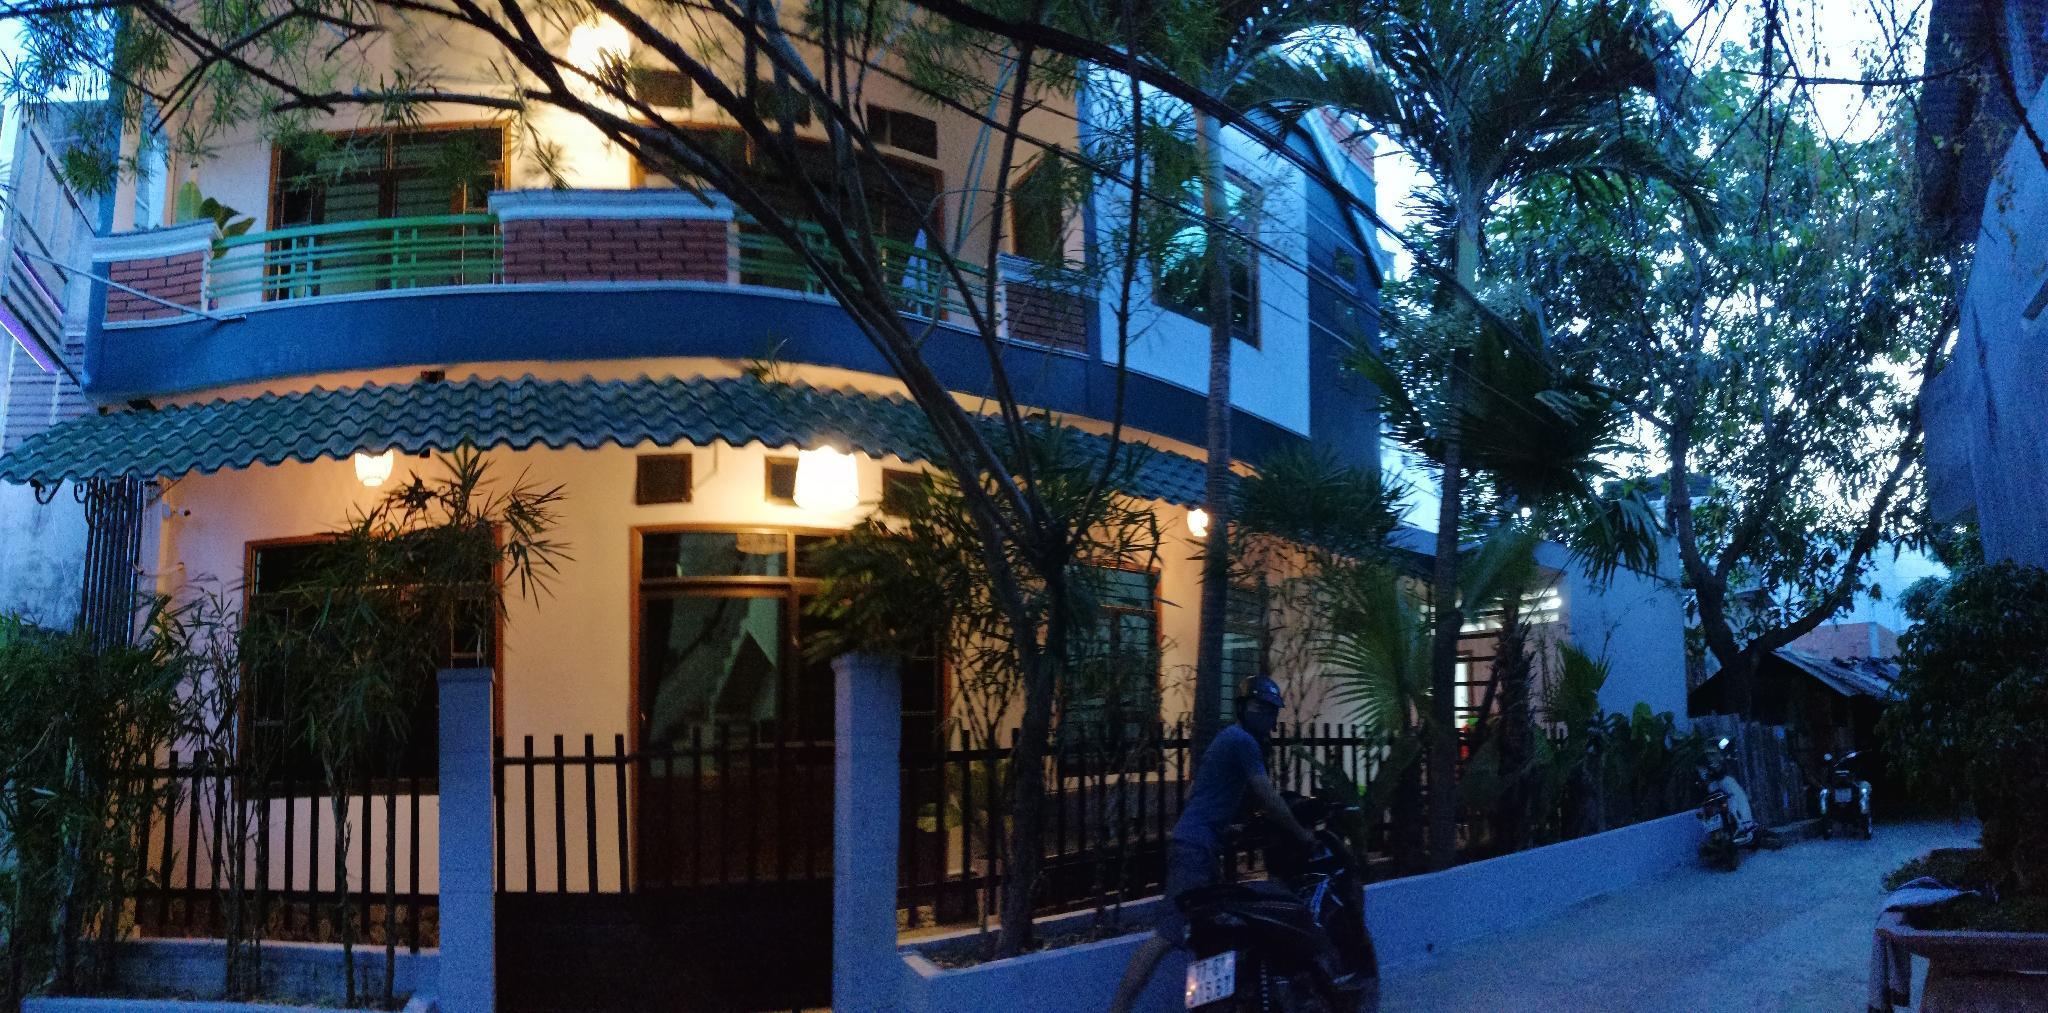 Green Villa House